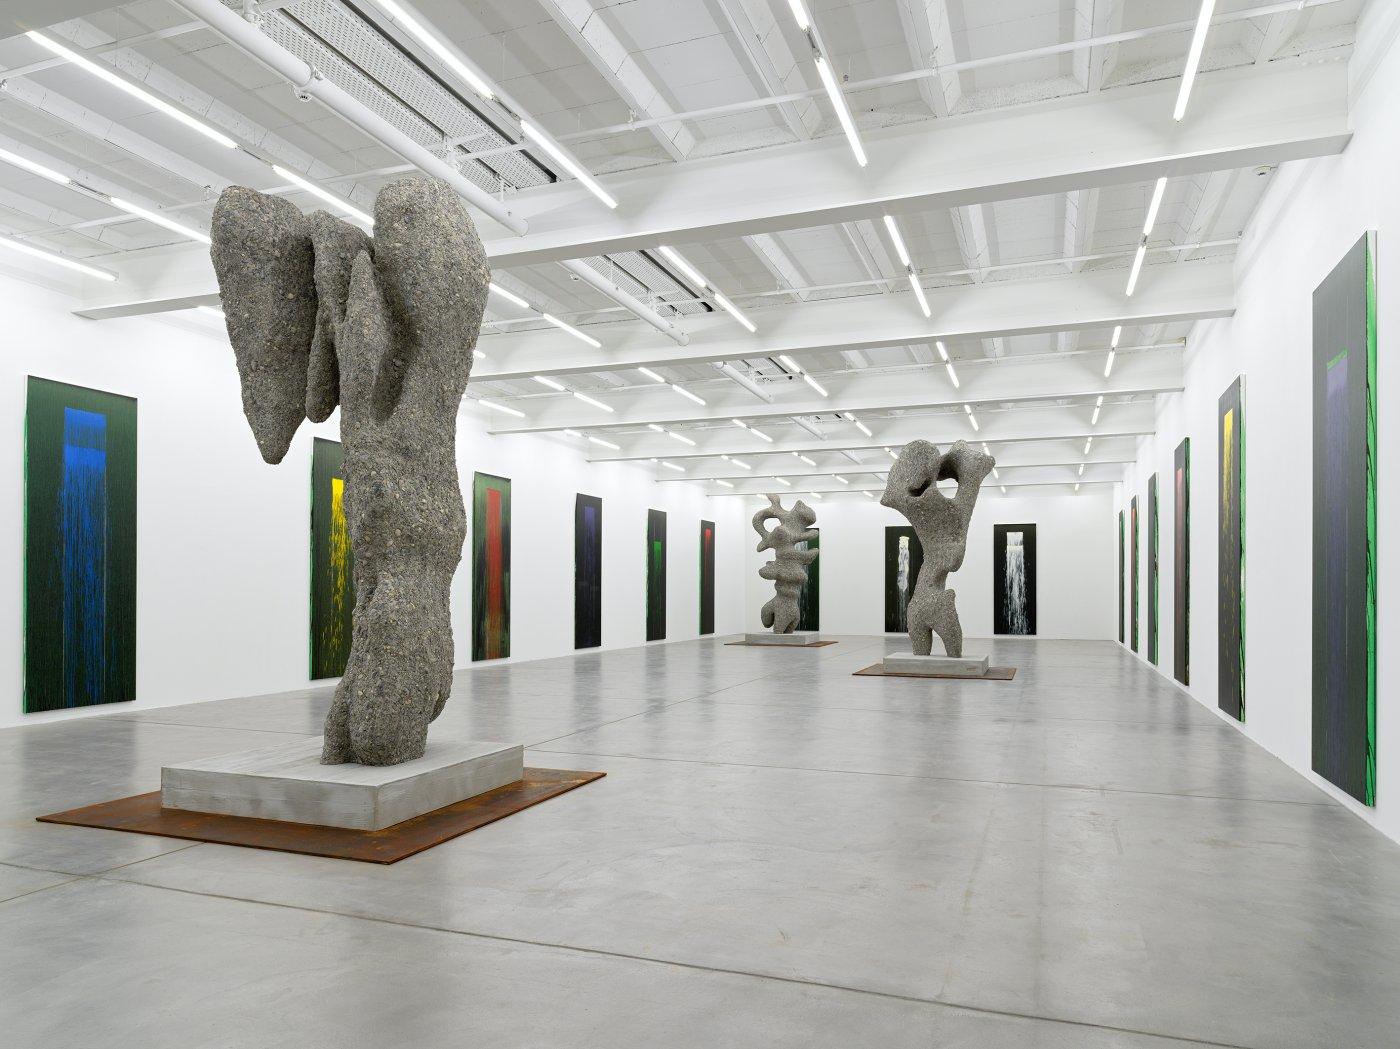 Galerie Eva Presenhuber Pat Steir Ugo Rondinone 2